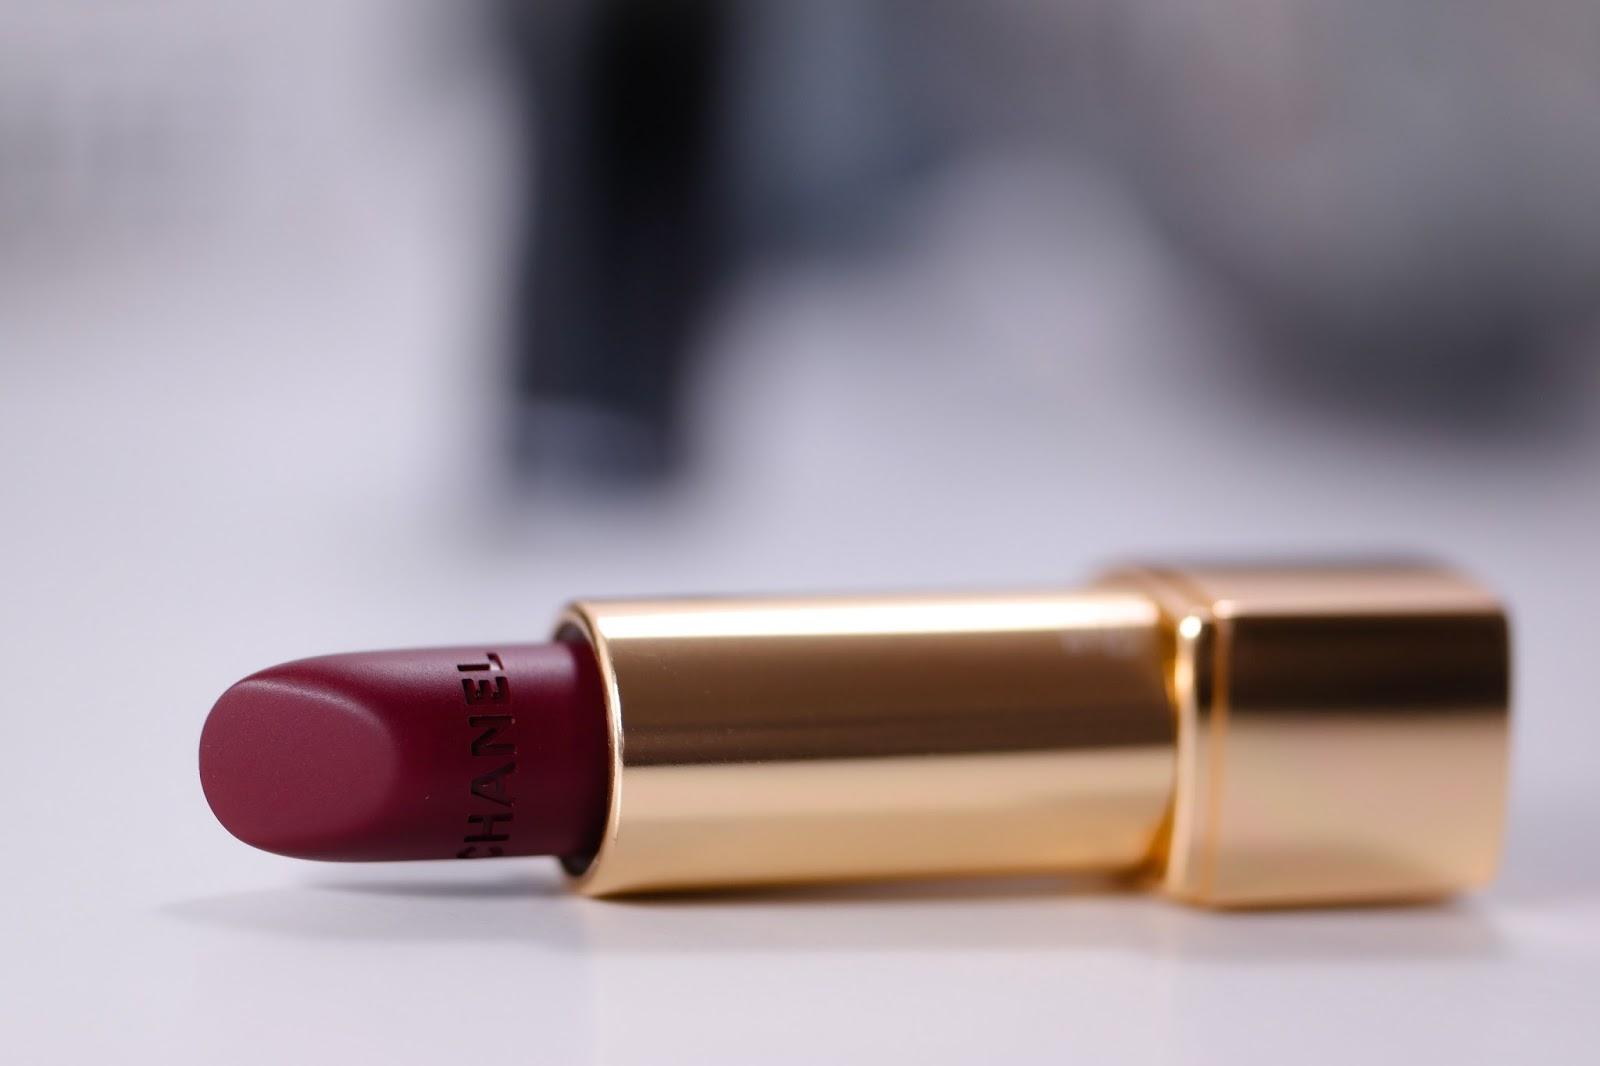 Rouge Allure Velvet Audace